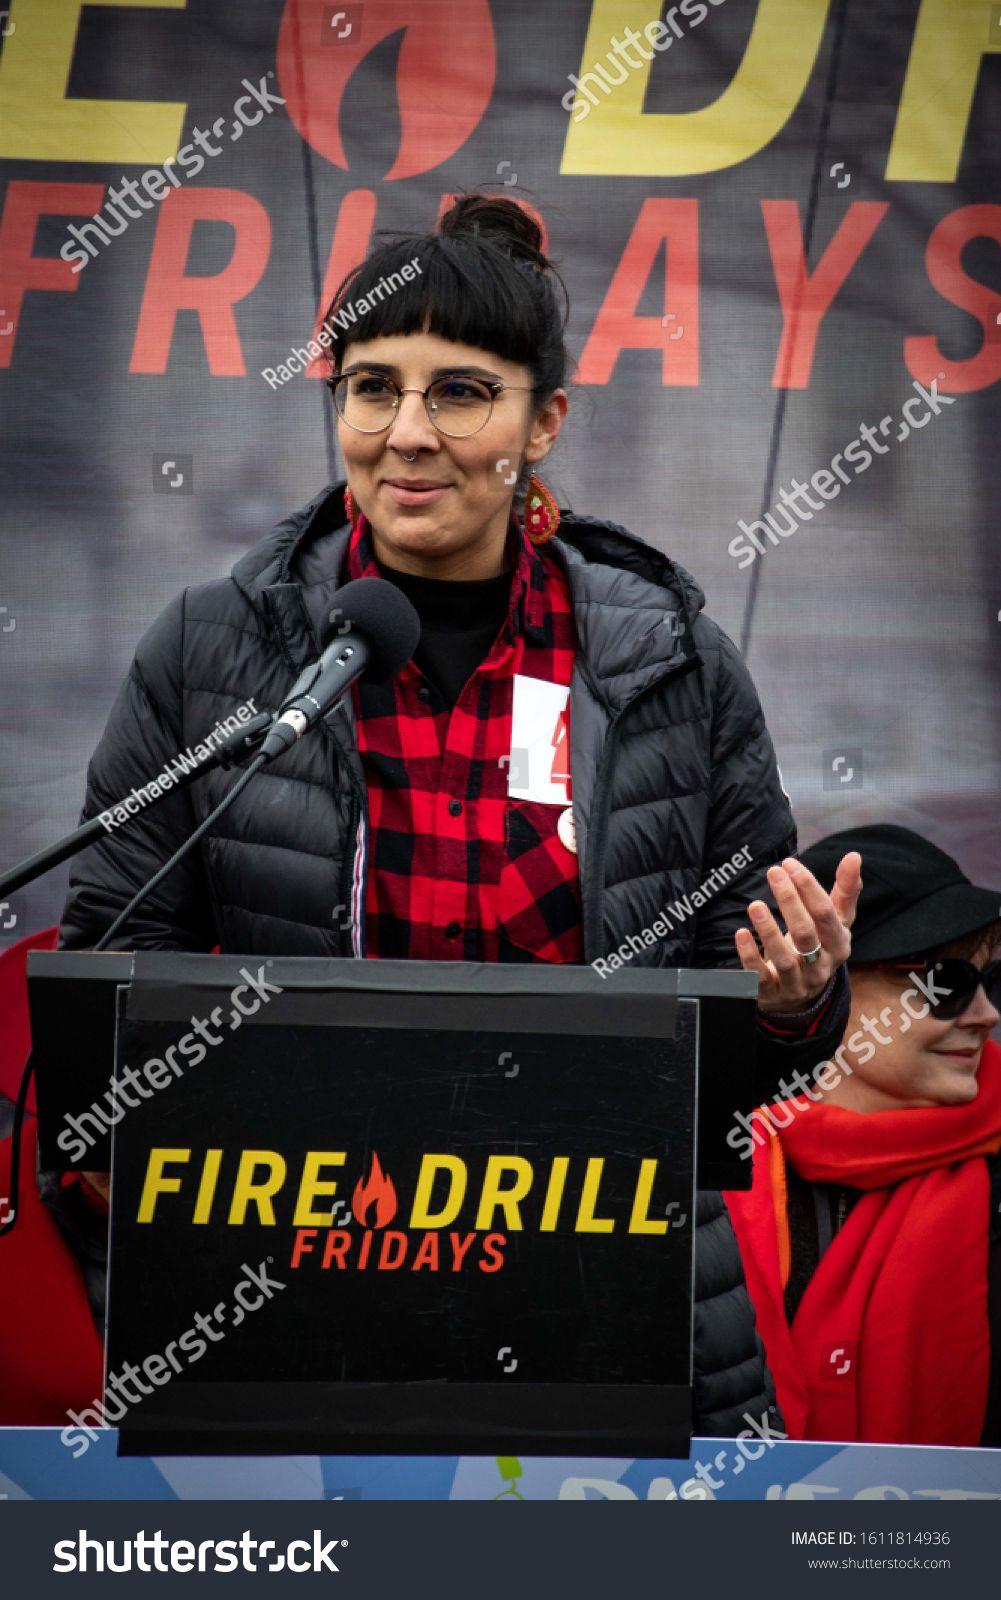 Washington Dc U002f Usa January 10 2020 Celebrities Join Hundreds Of Protesters At Jane Fonda S Final Fire Drill Spo Jane Fonda Photo Editing Stock Photos